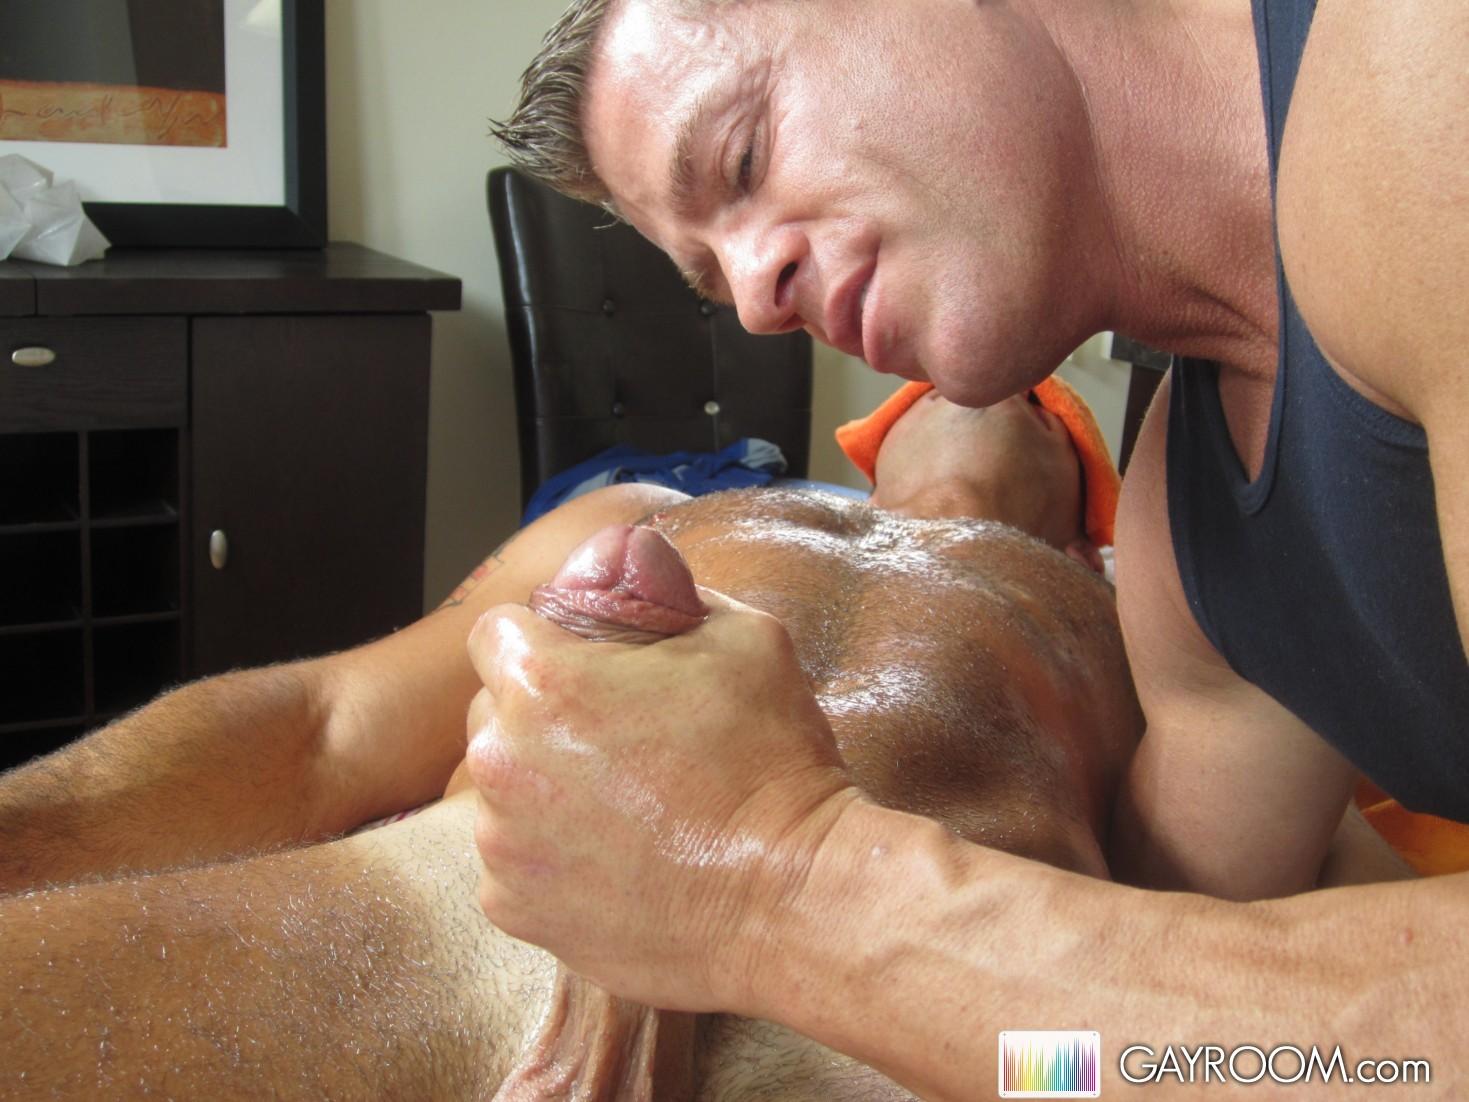 Hot Muscle Gay Massage